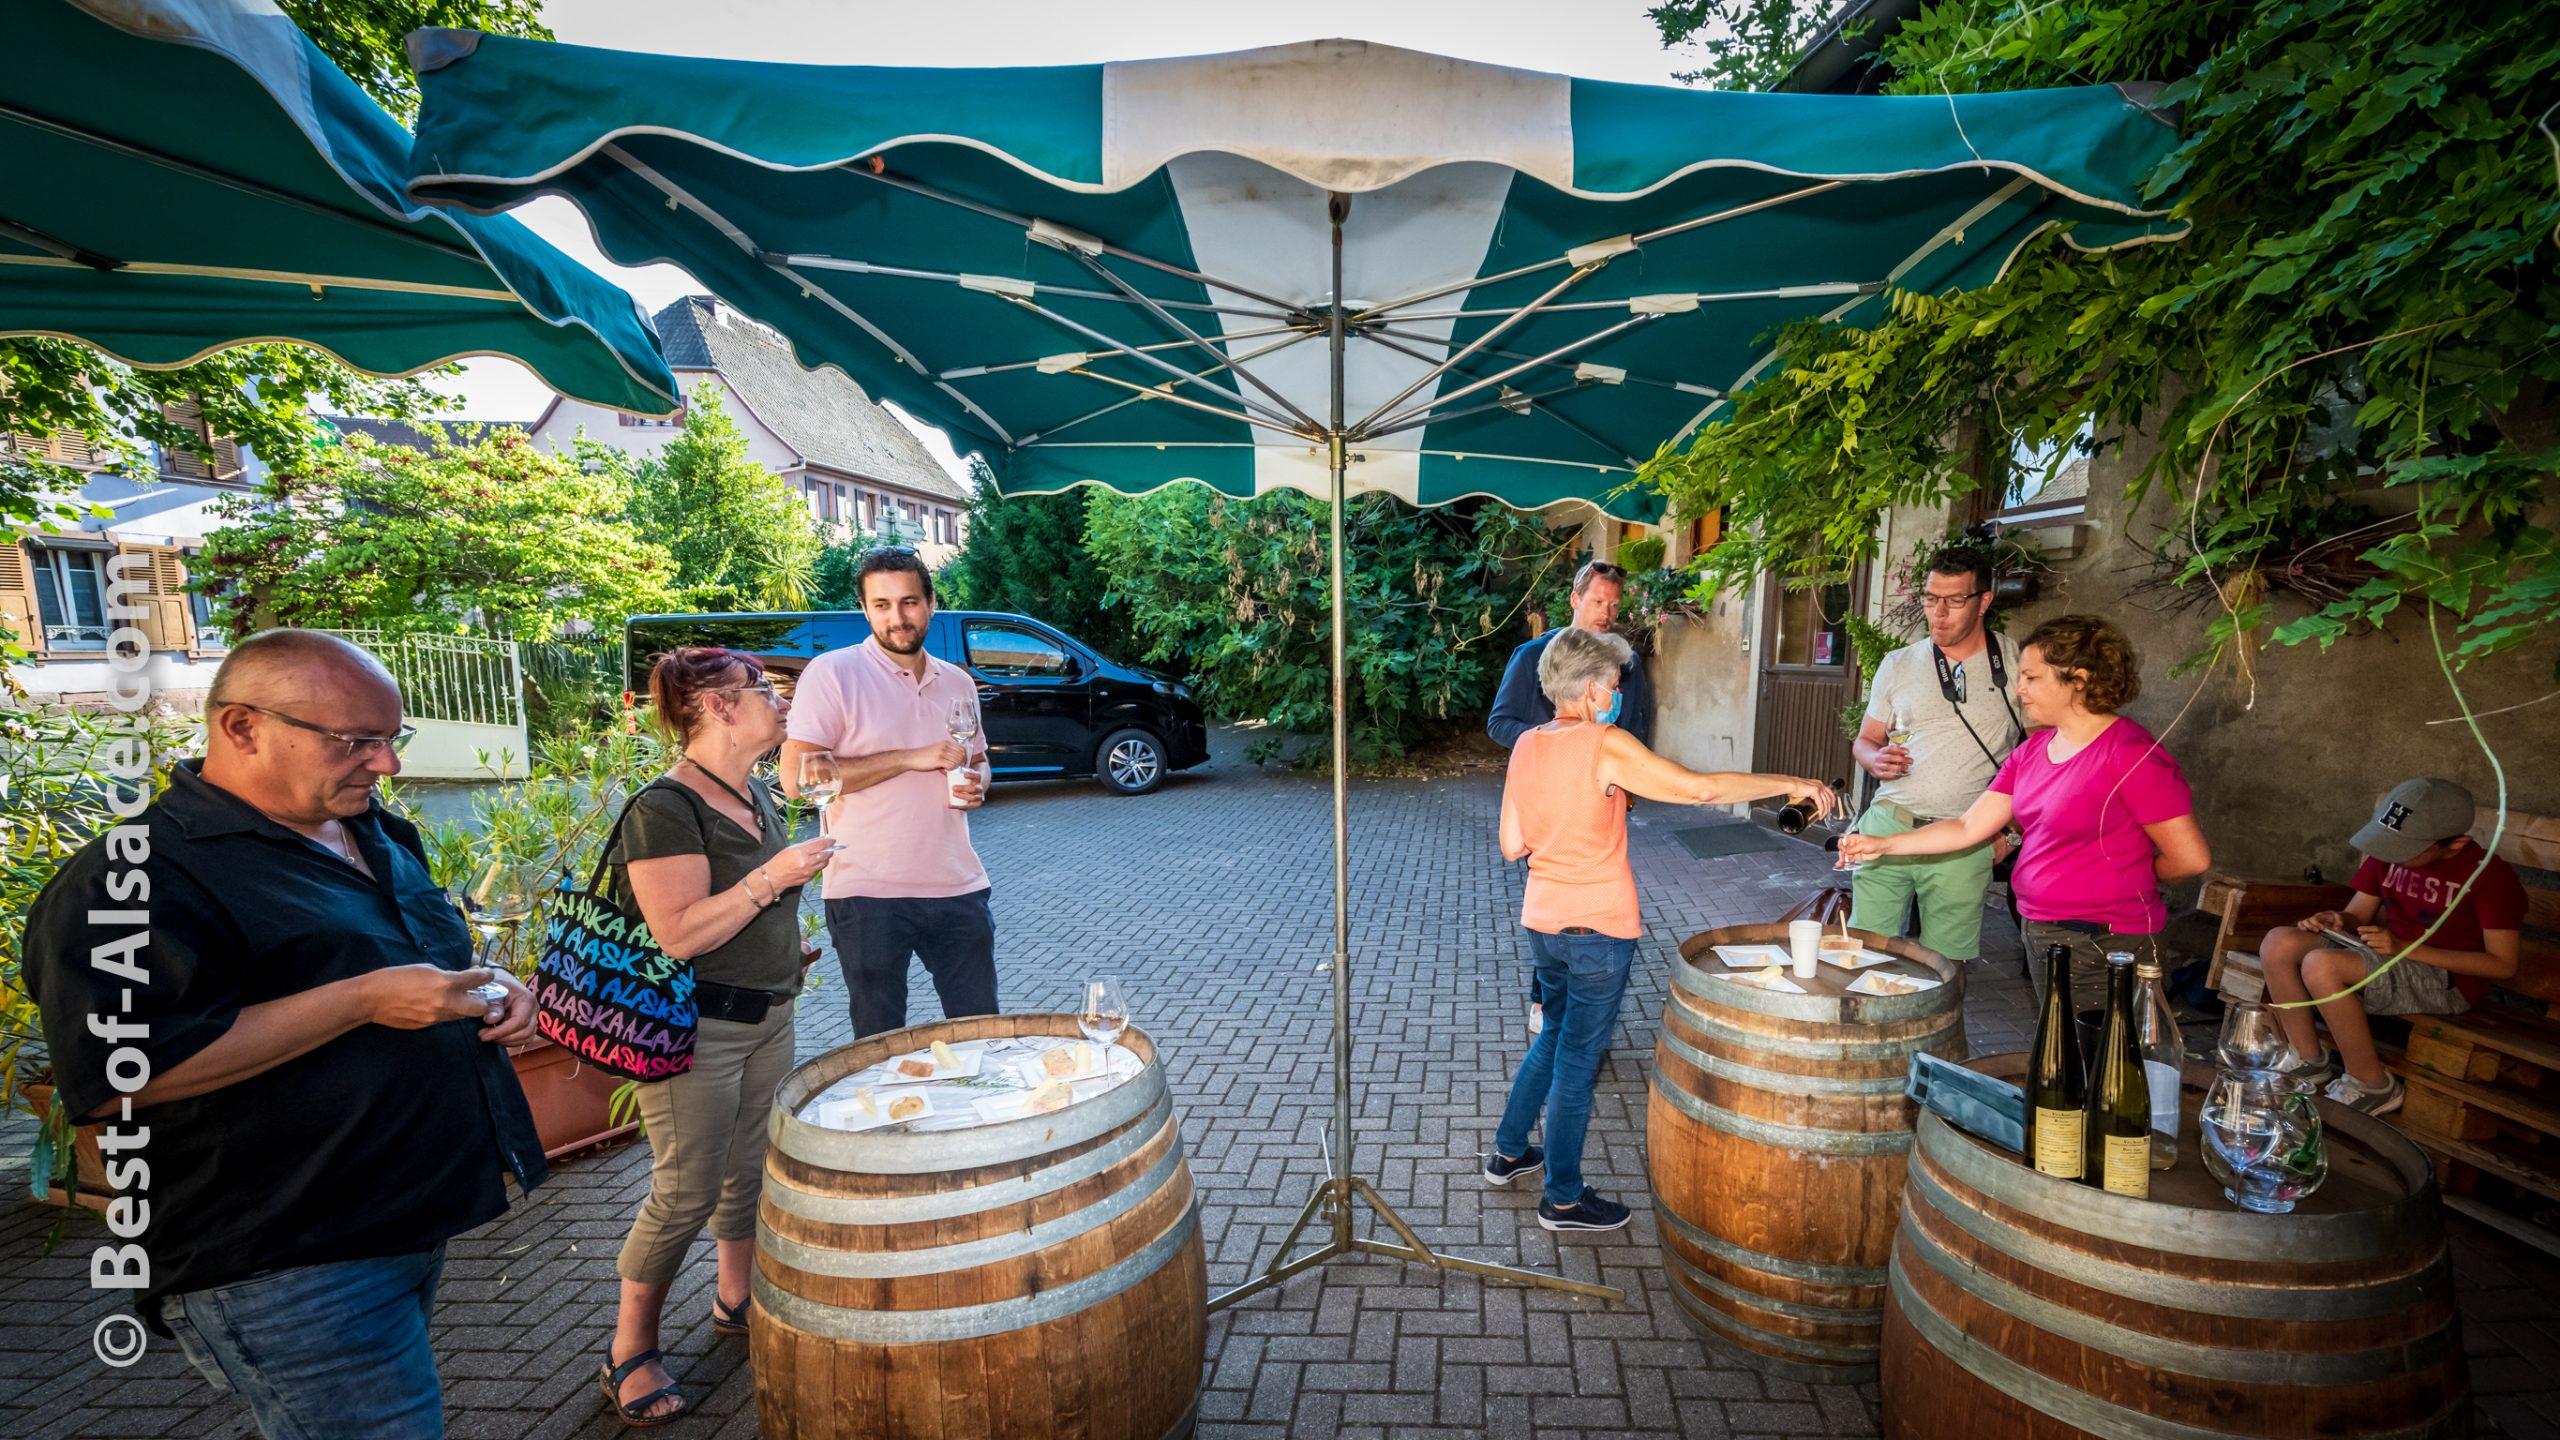 Best-Of-Alsace-Montagne-sortie-07JUL2020-4161